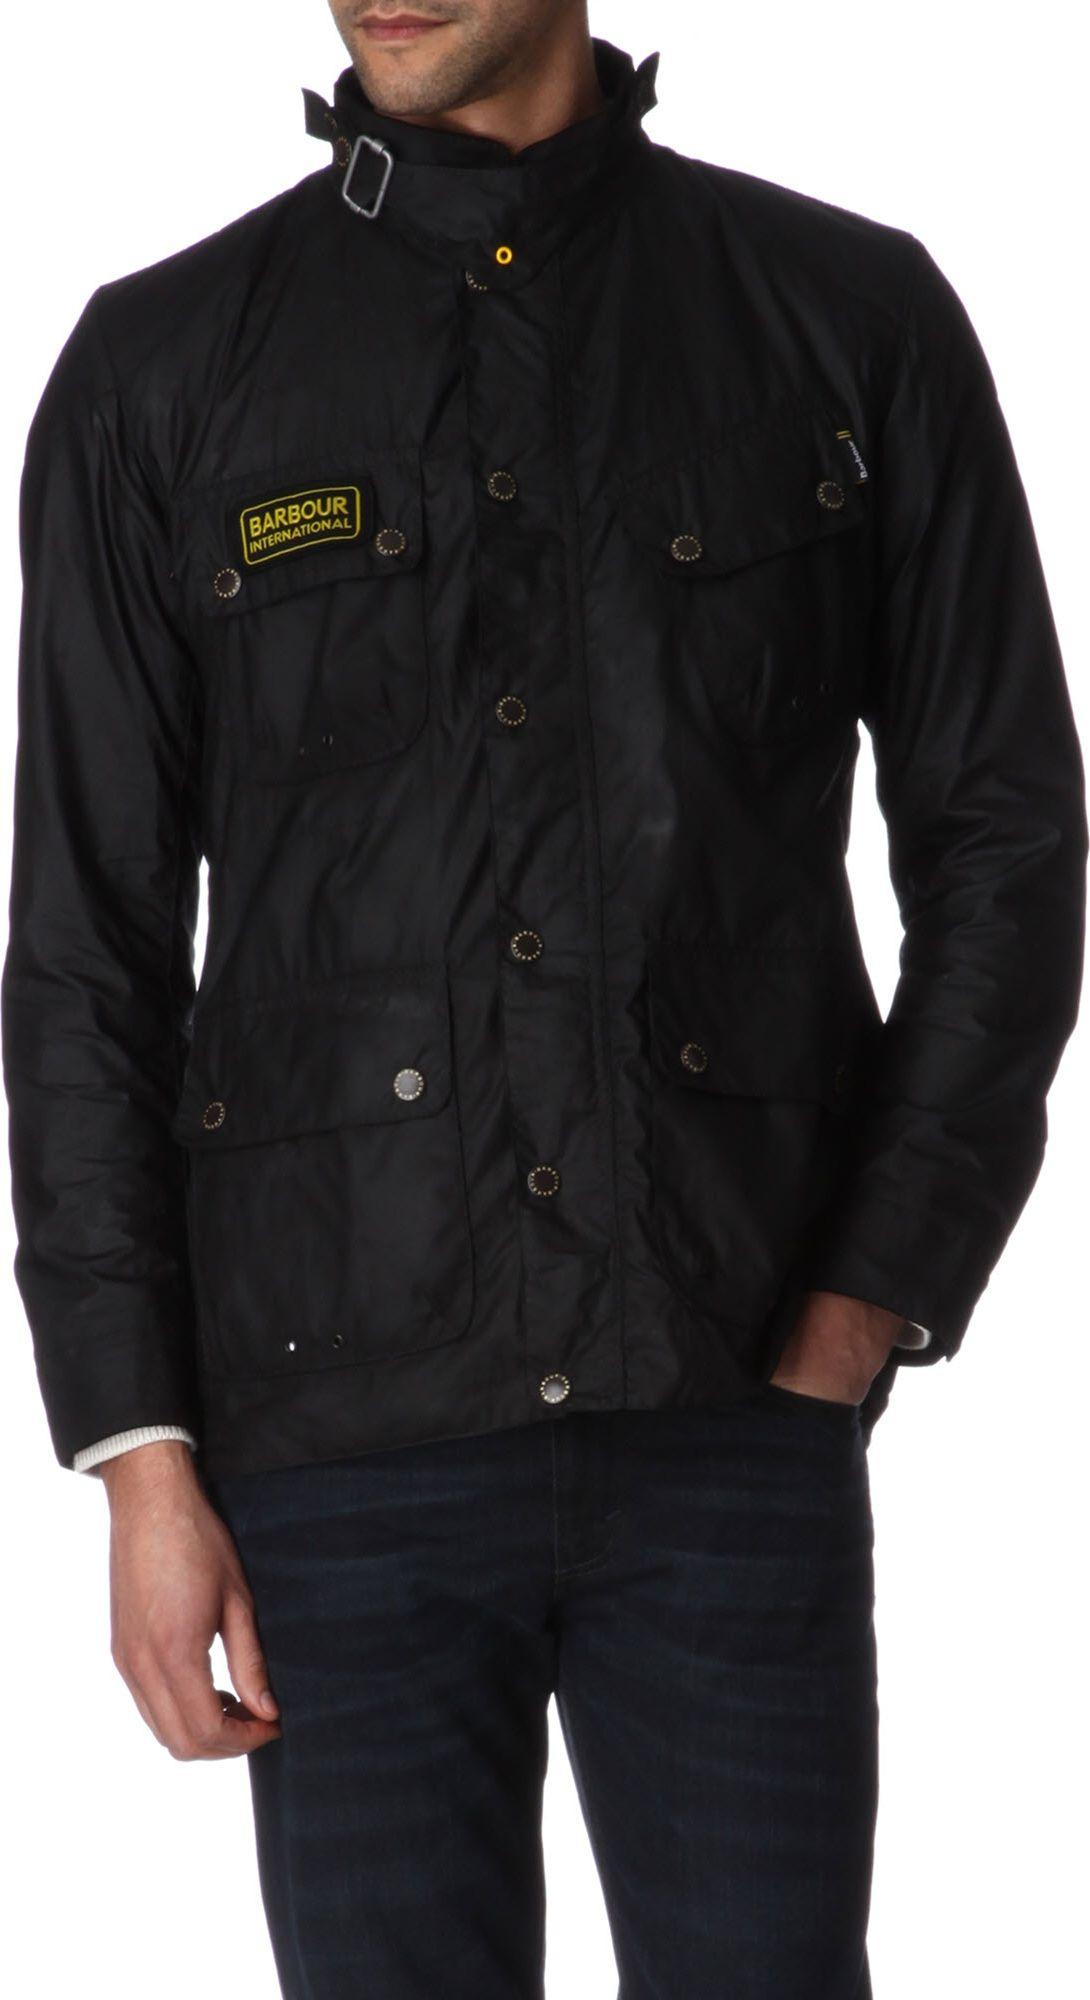 Womens barbour jacket selfridges